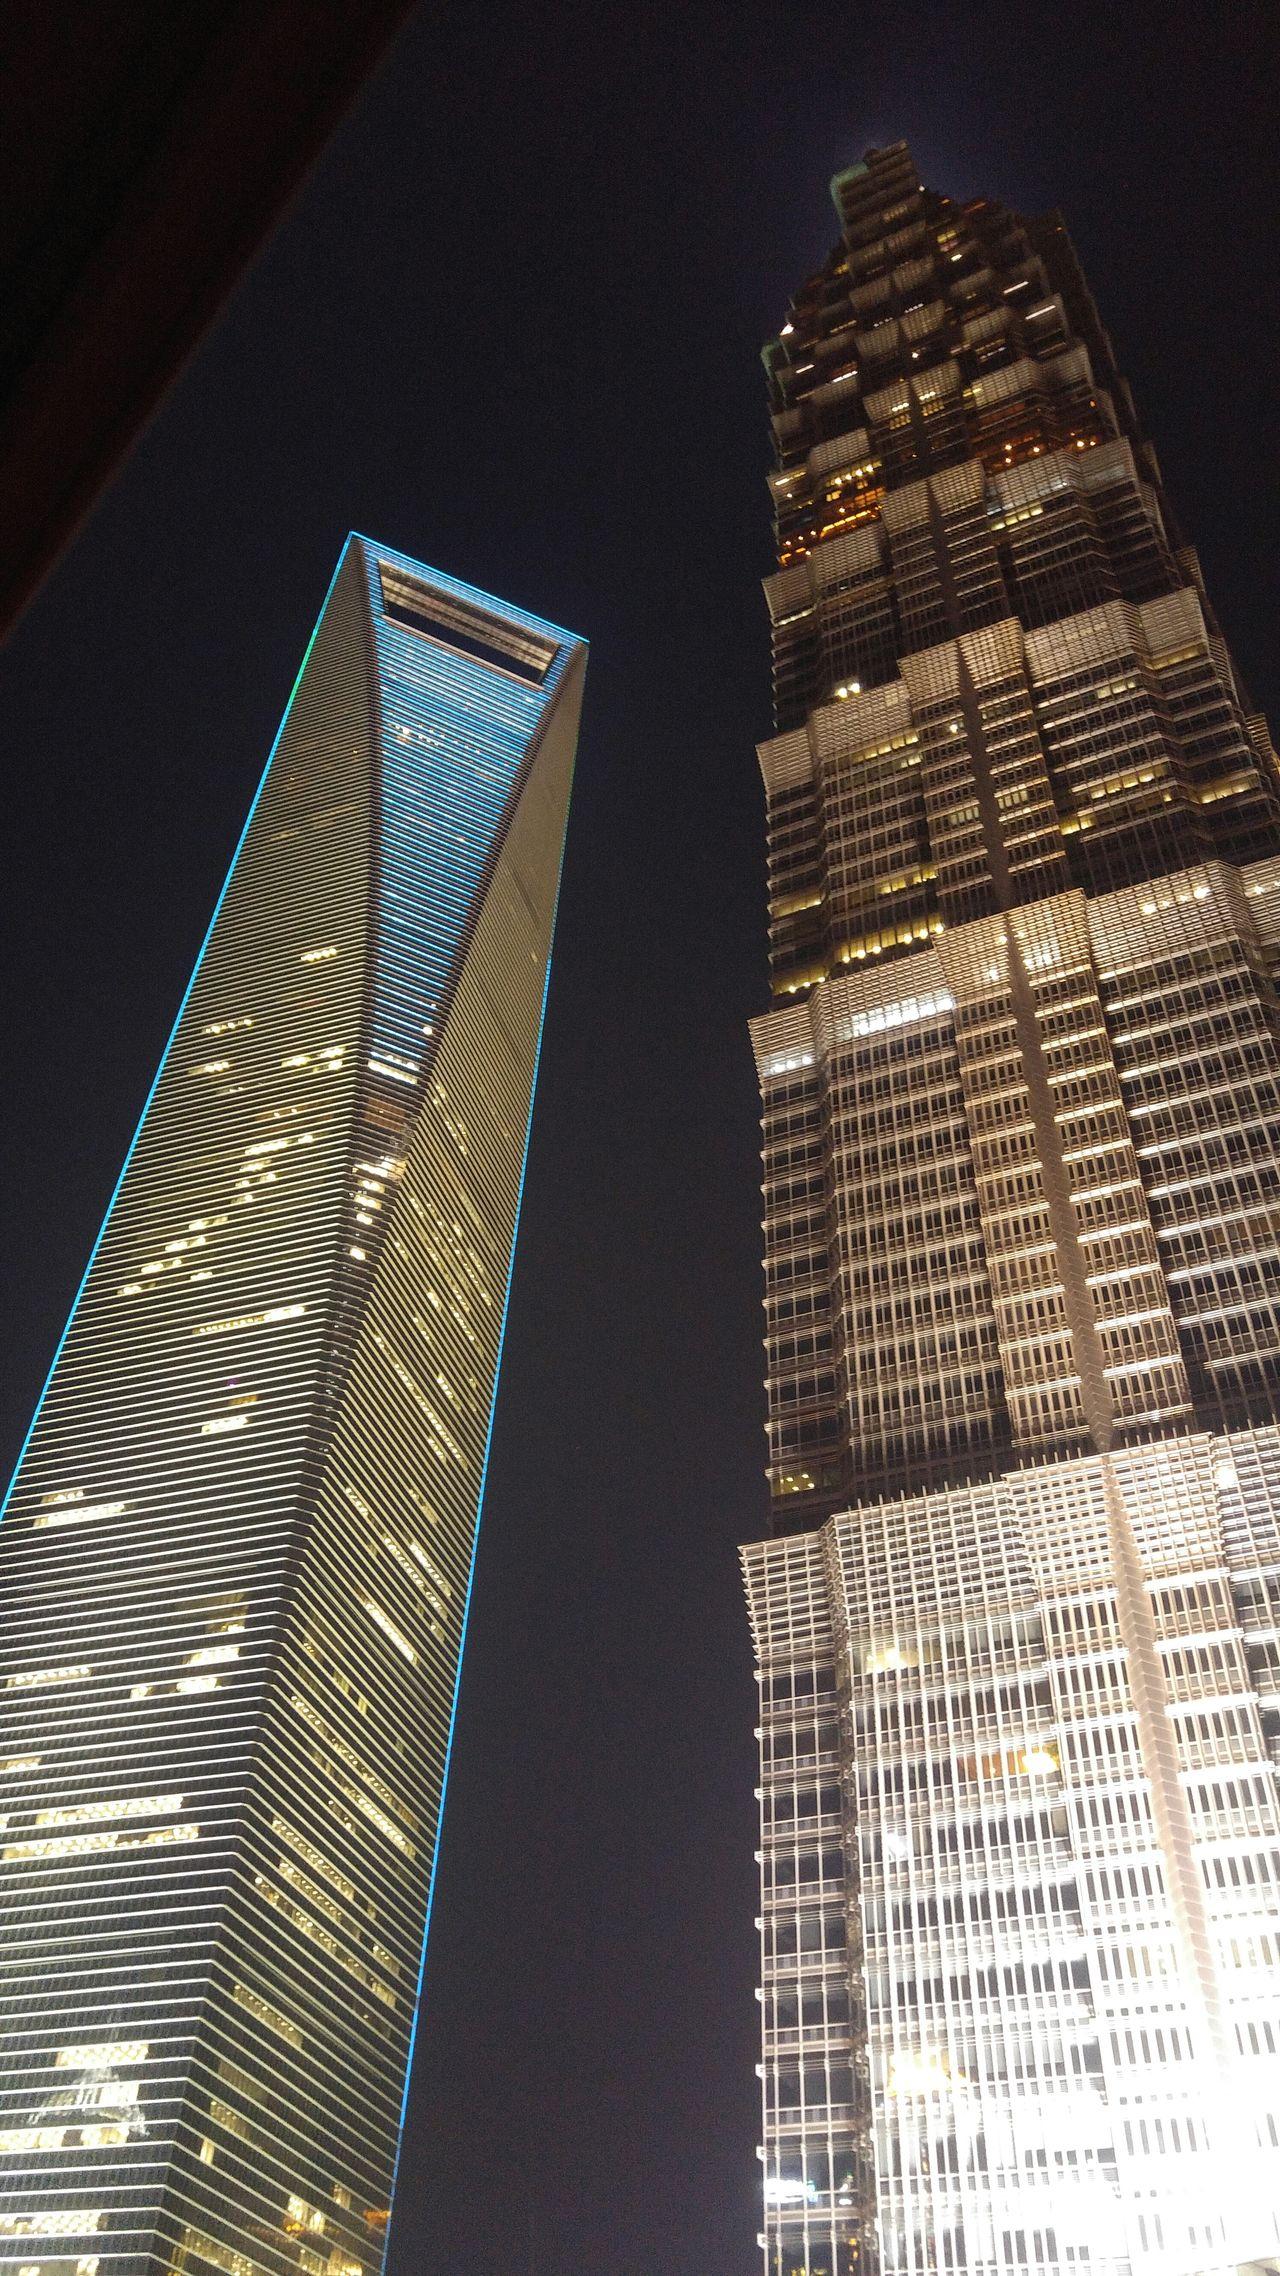 Shanghi night view